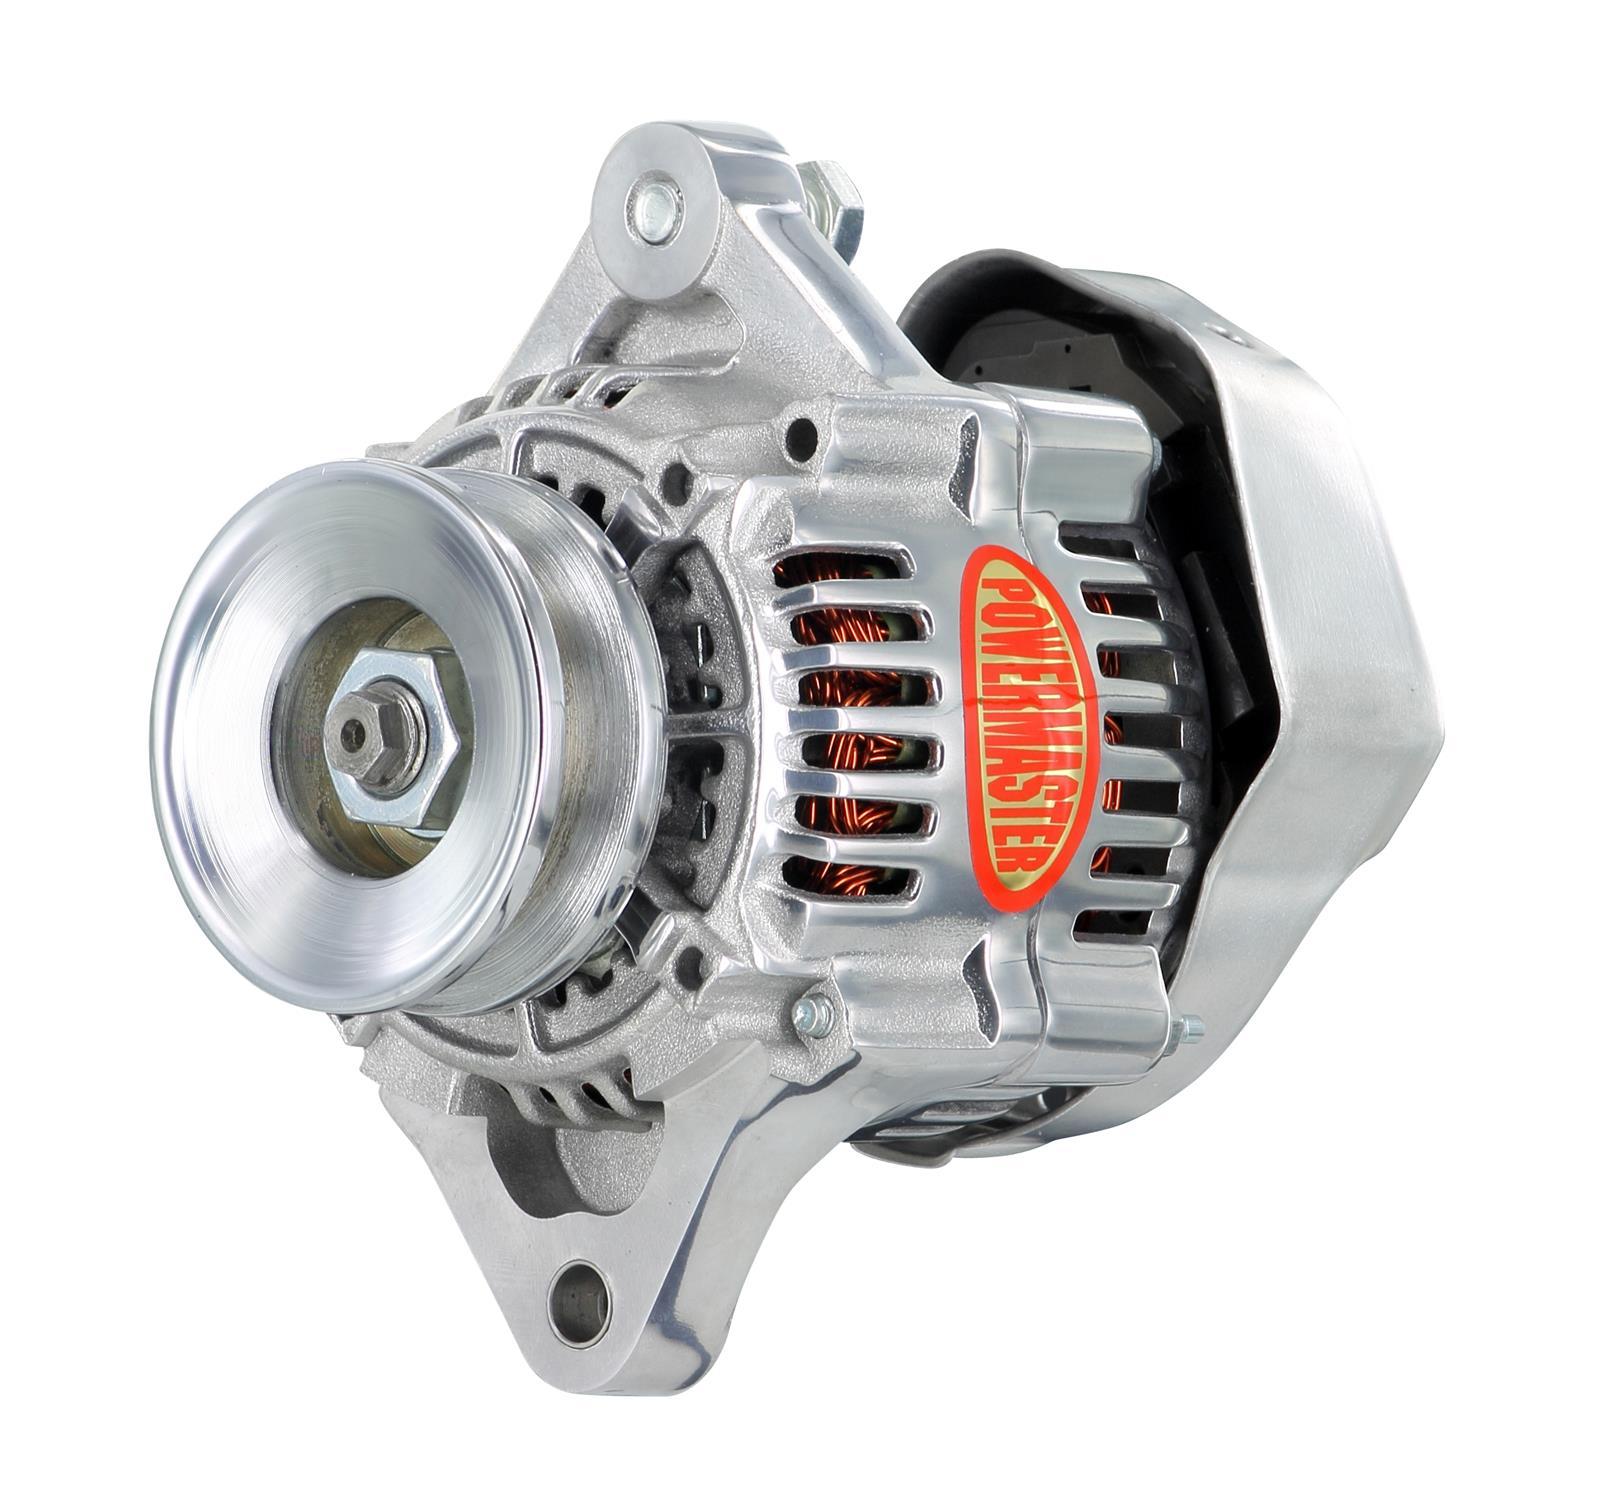 Powermaster Race Alternators 28162 Free Shipping On Orders Over Alternator Wiring Diagram 99 At Summit Racing